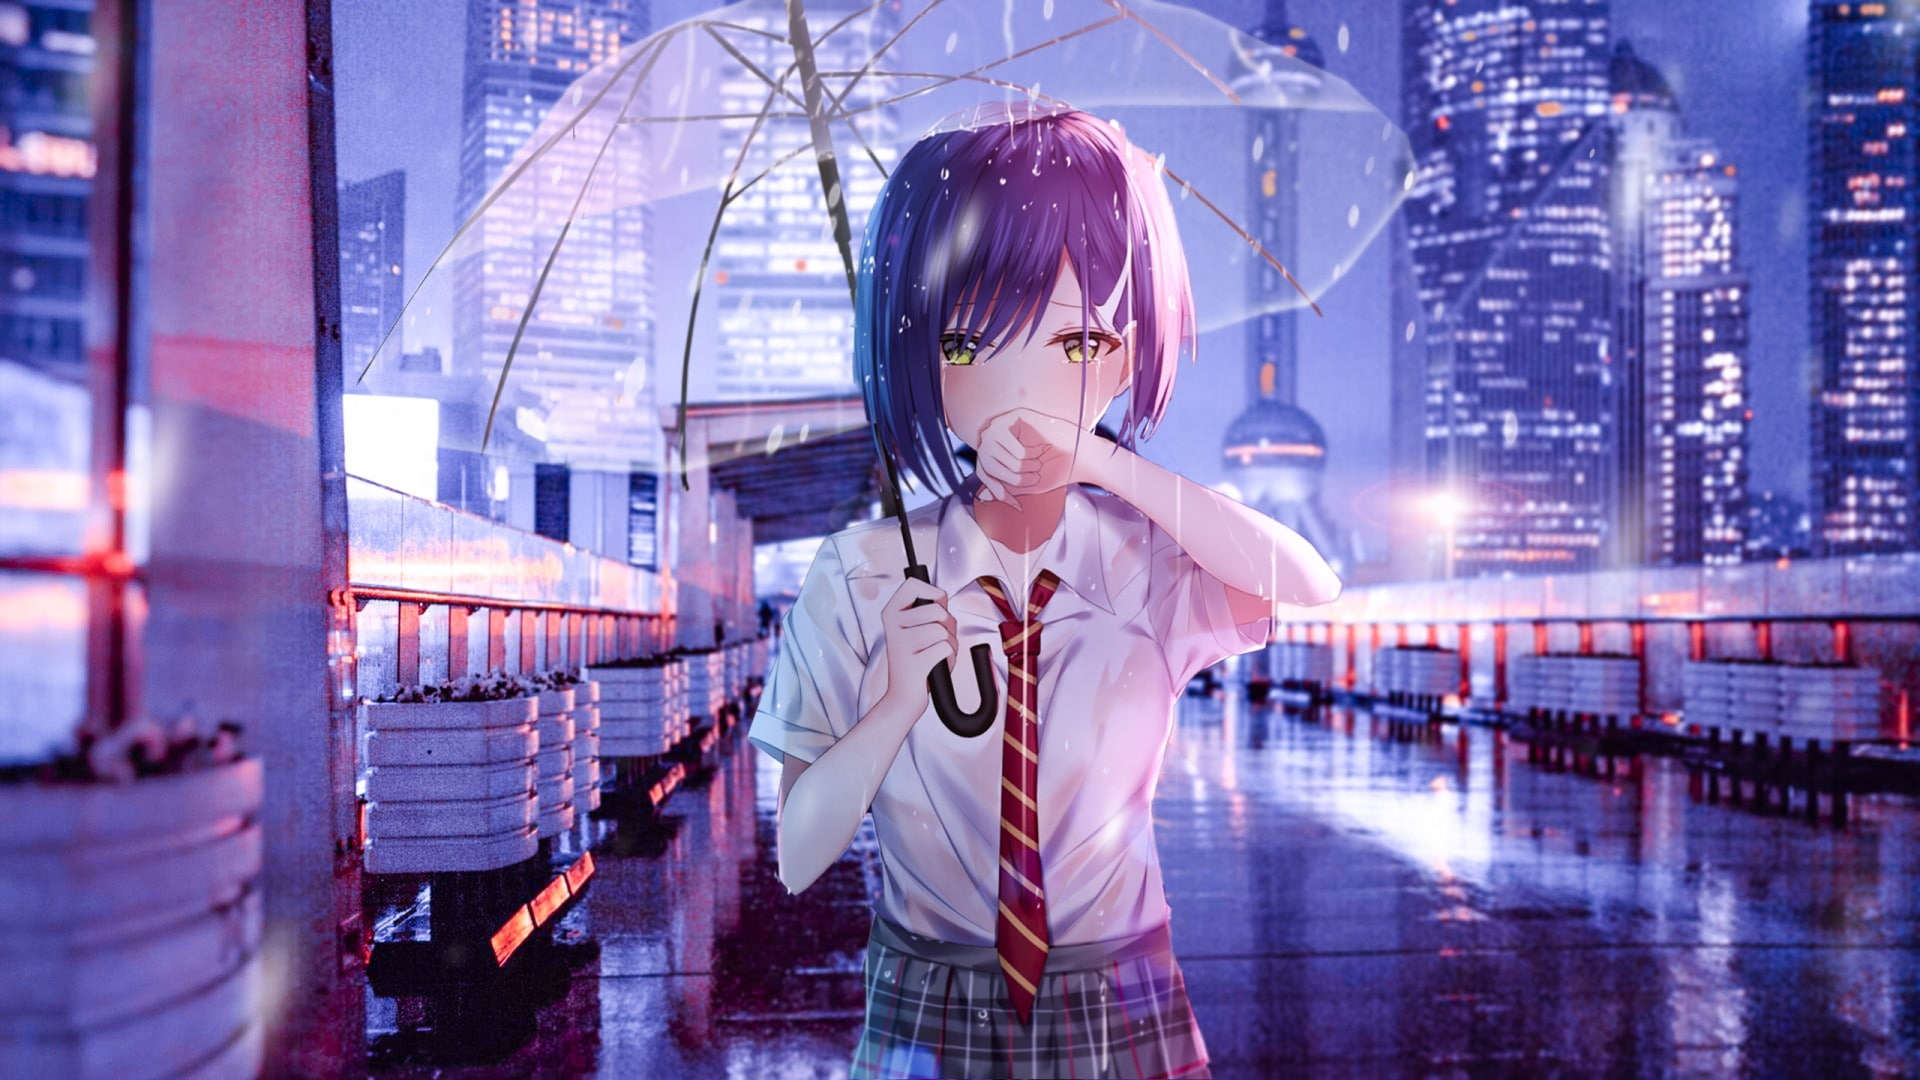 Desktop Wallpaper Anime School Girl Lucu